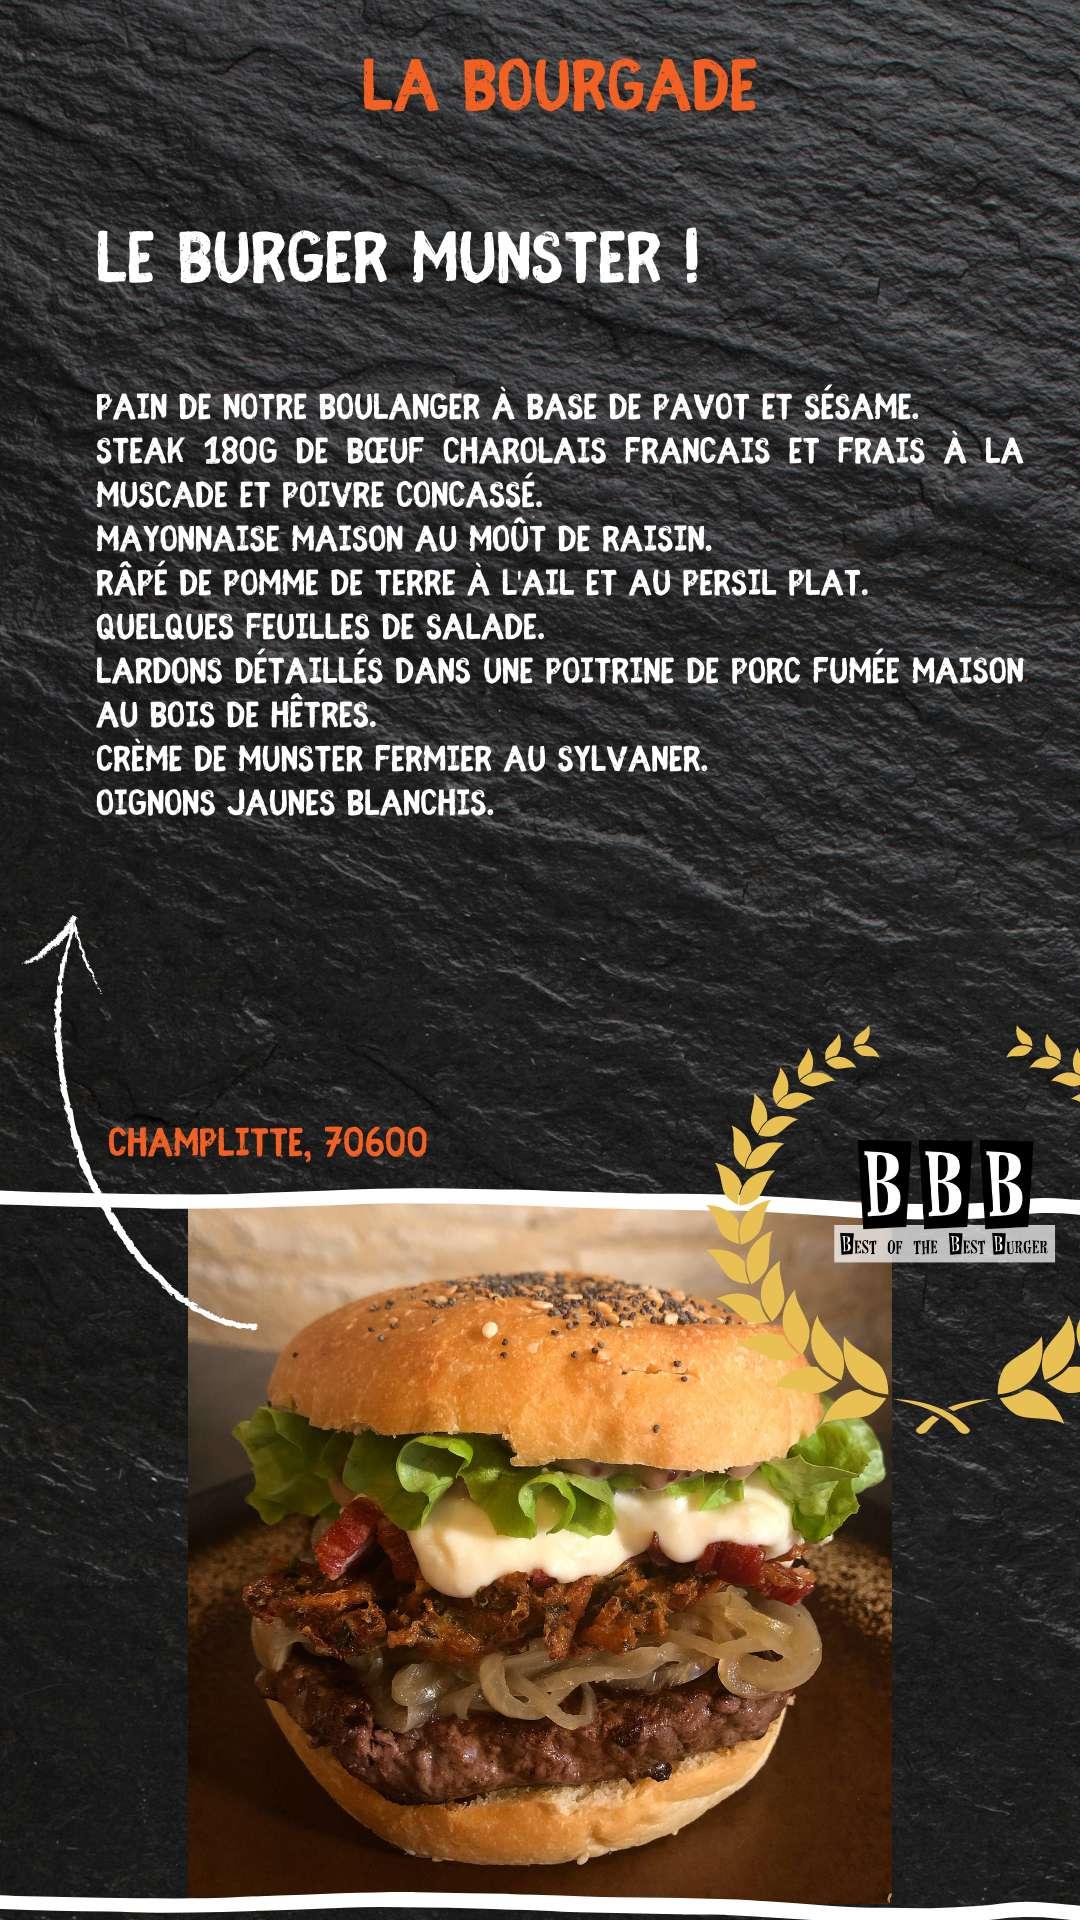 Burger de la Bourgade